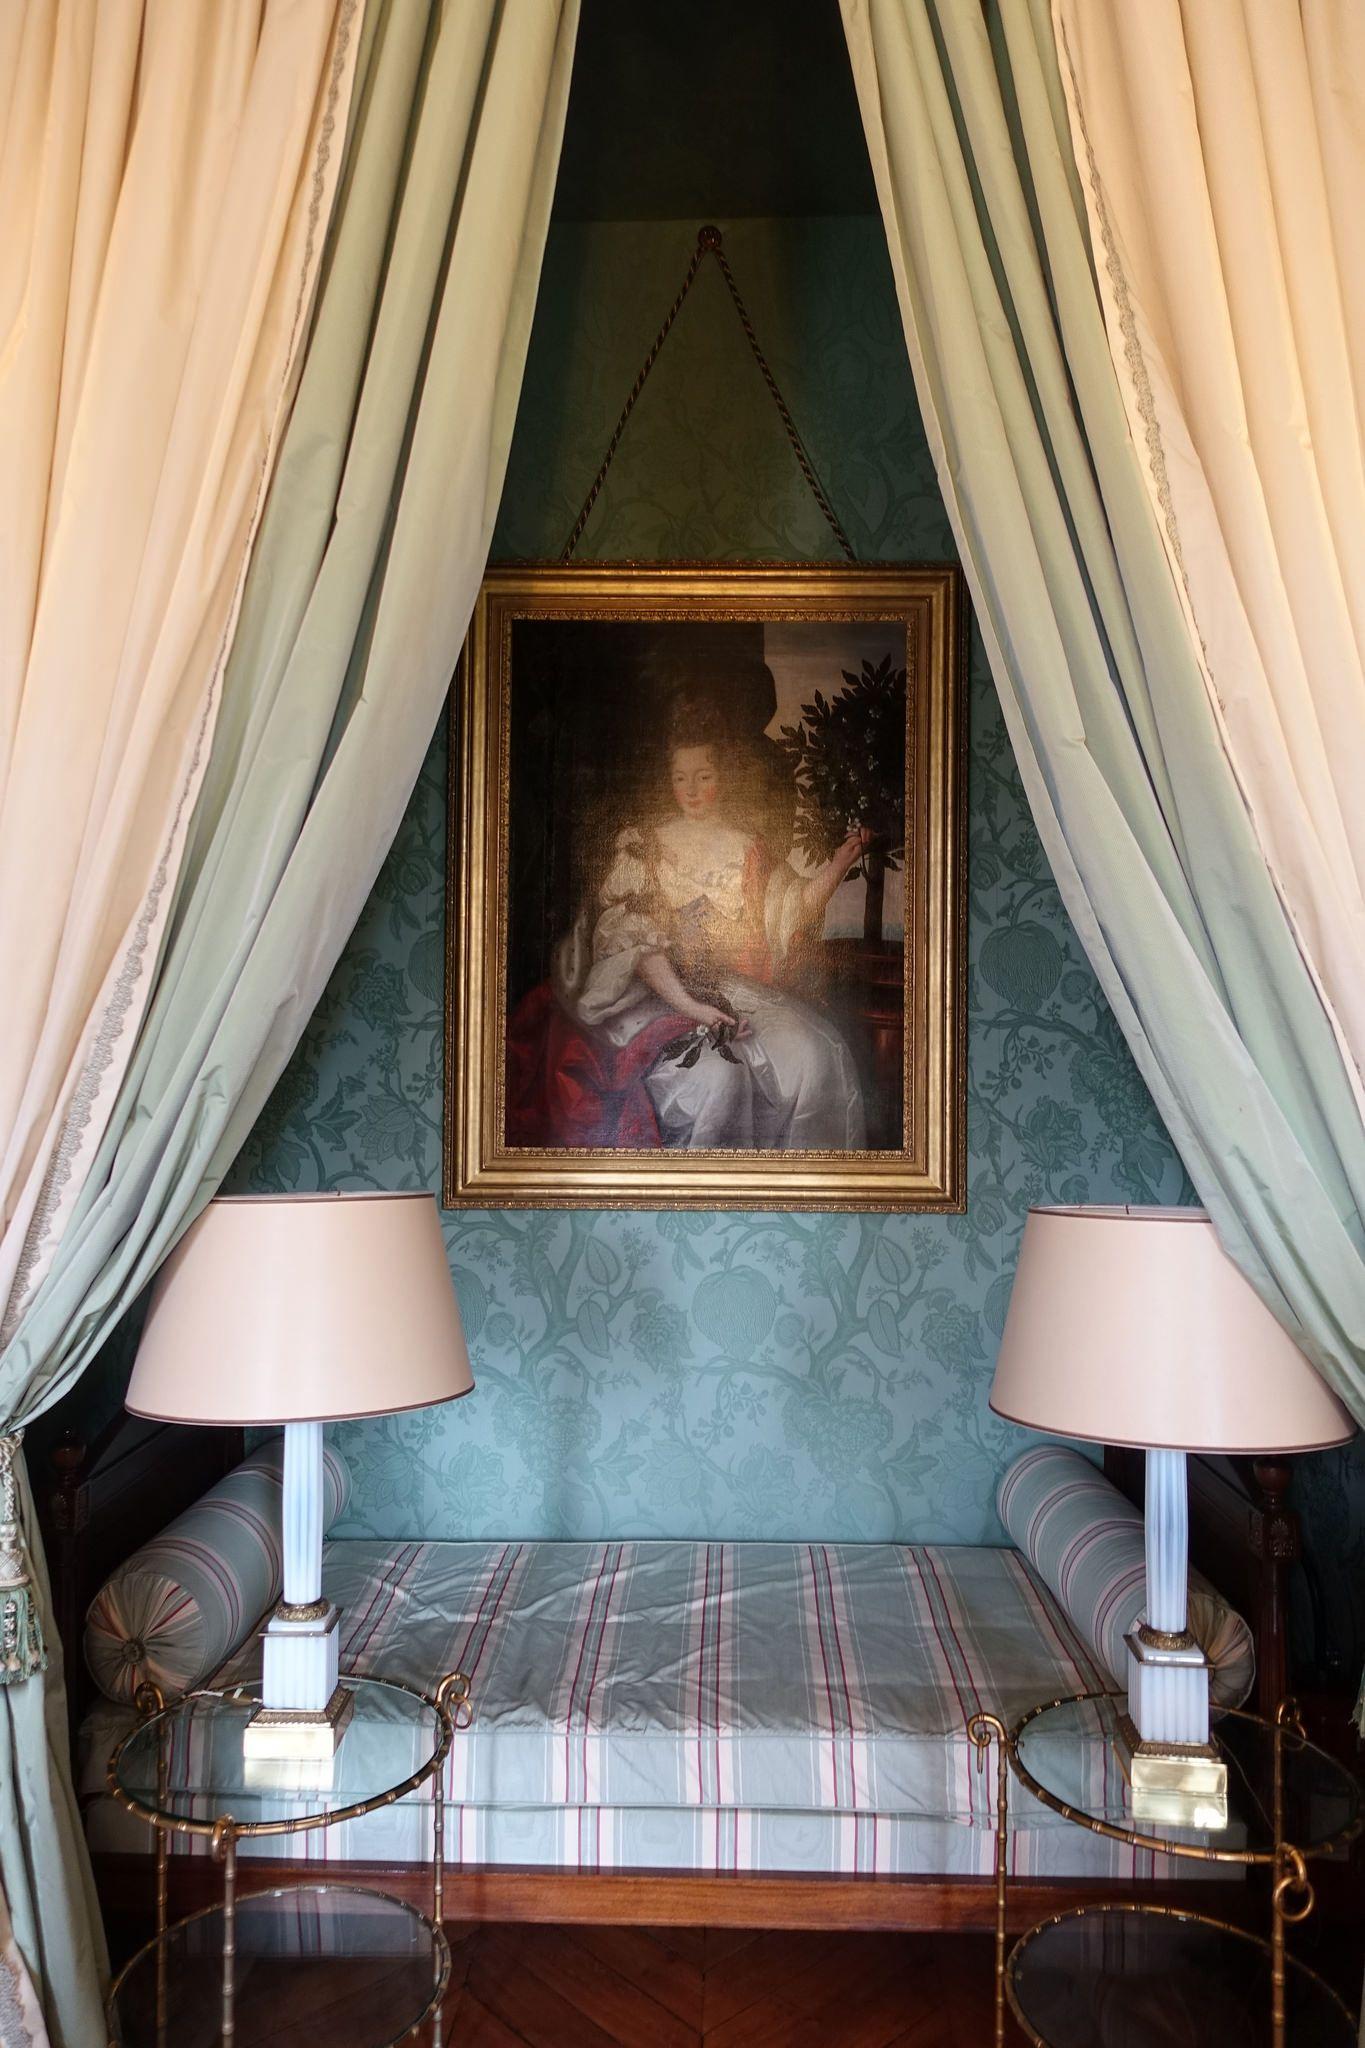 Internal Affairs Interior Designers: Chambre De La Reine @ Quai D'Orsay @ Ministry Of Foreign